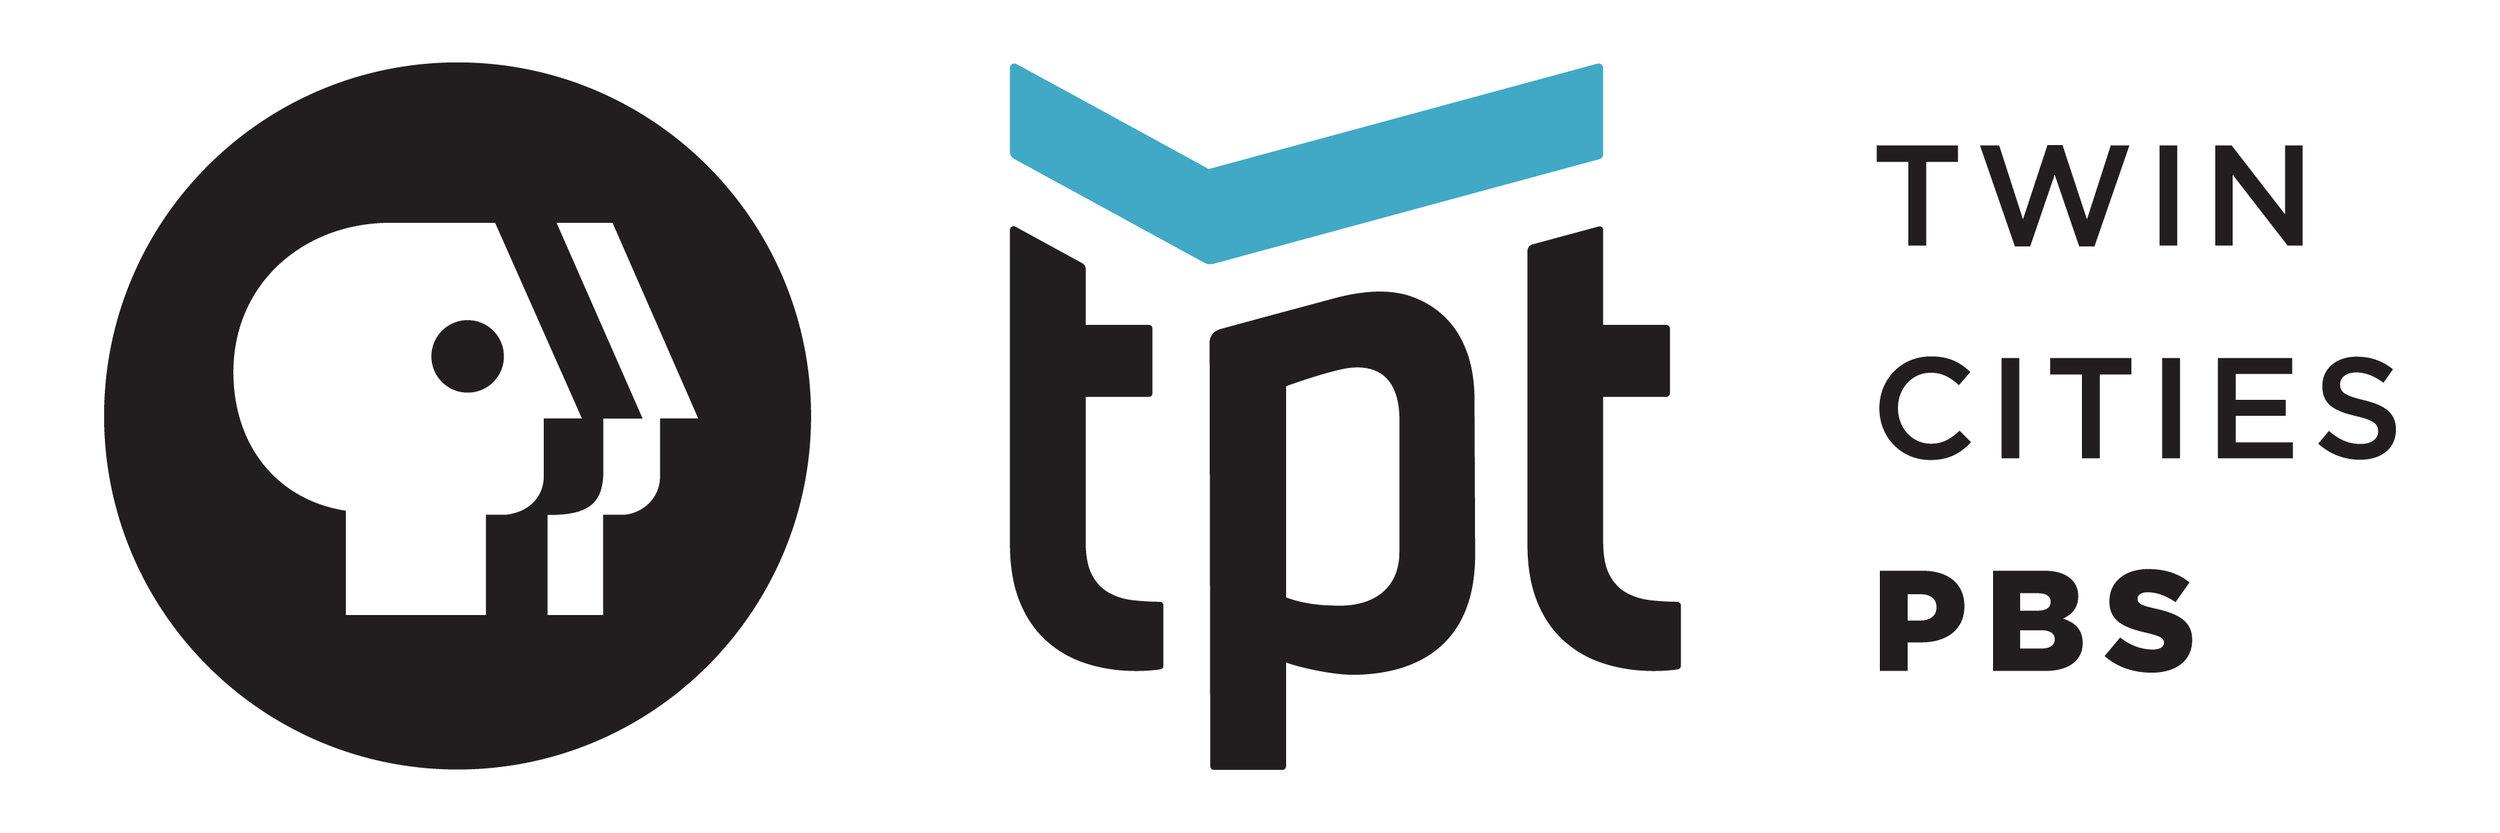 TPT_PBS_RGB_Desc.jpg